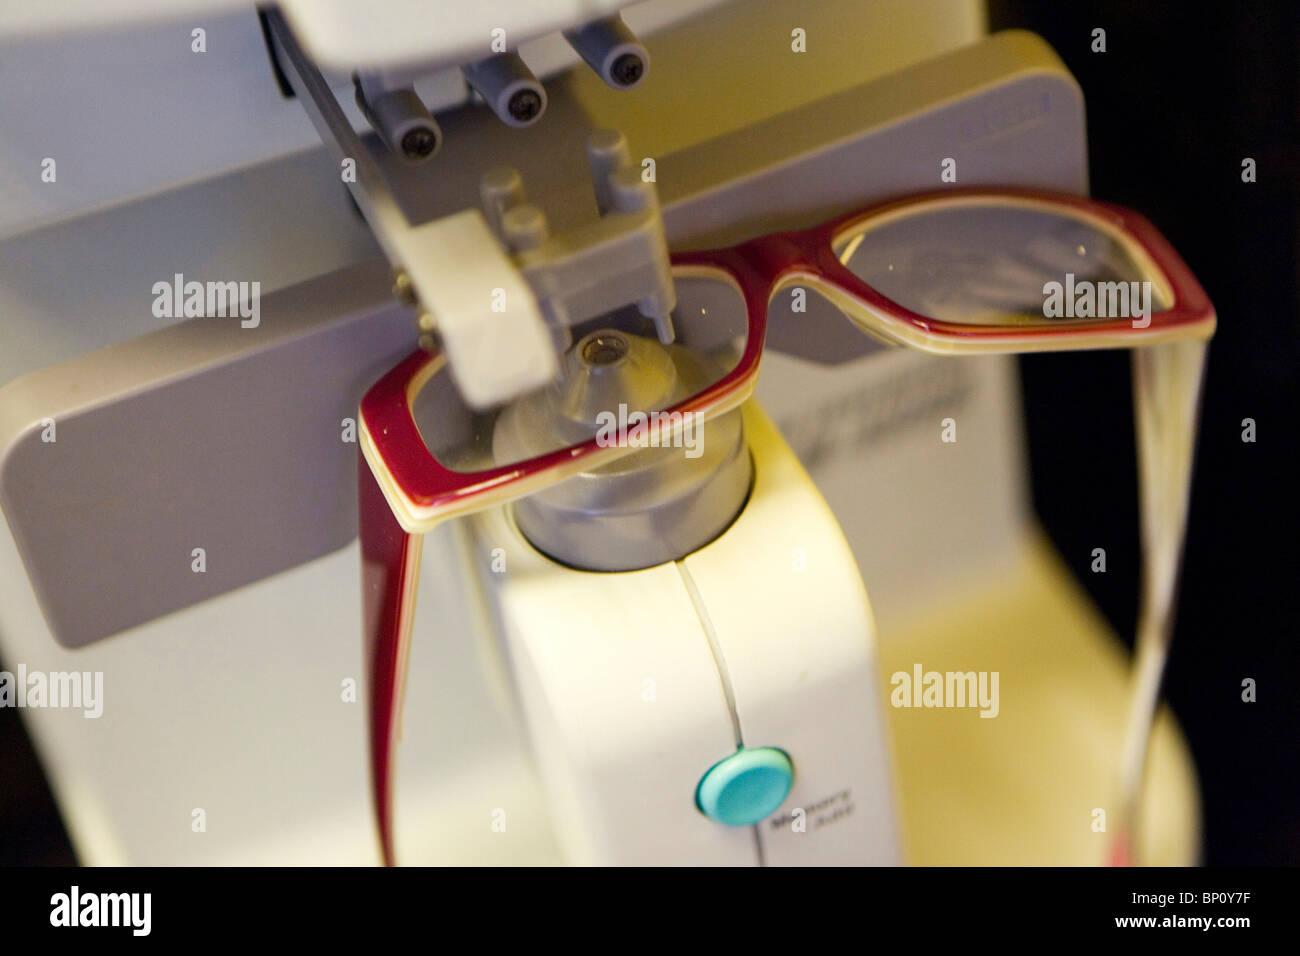 Fabricación de gafas Imagen De Stock